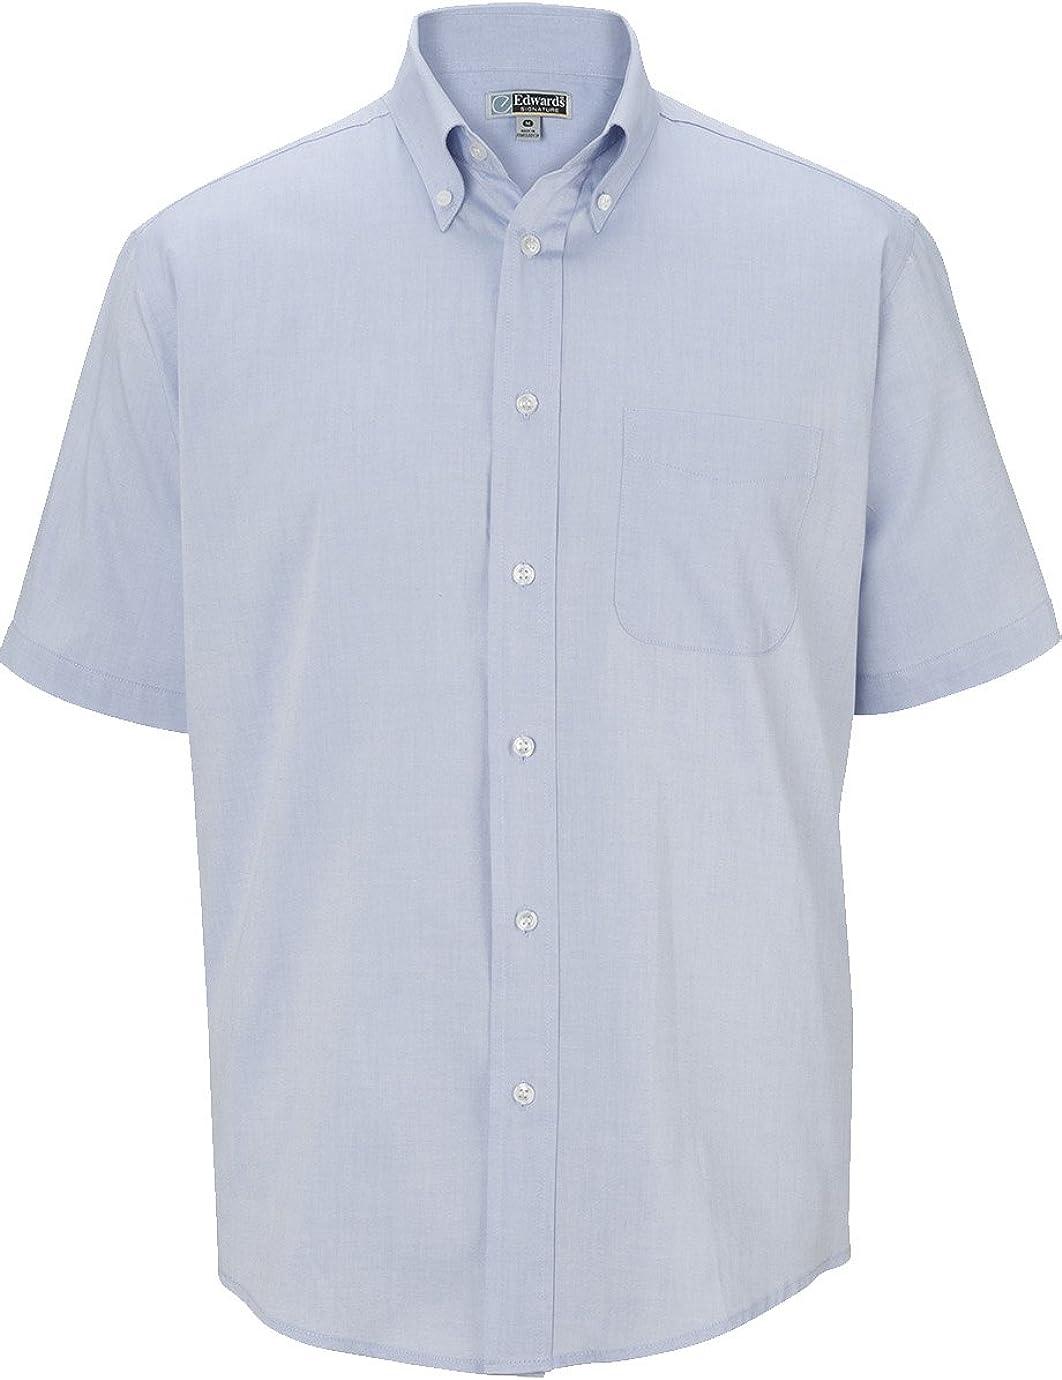 Edwards Garment Men's Short Sleeve Pinpoint Oxford Cotton Rich Shirt